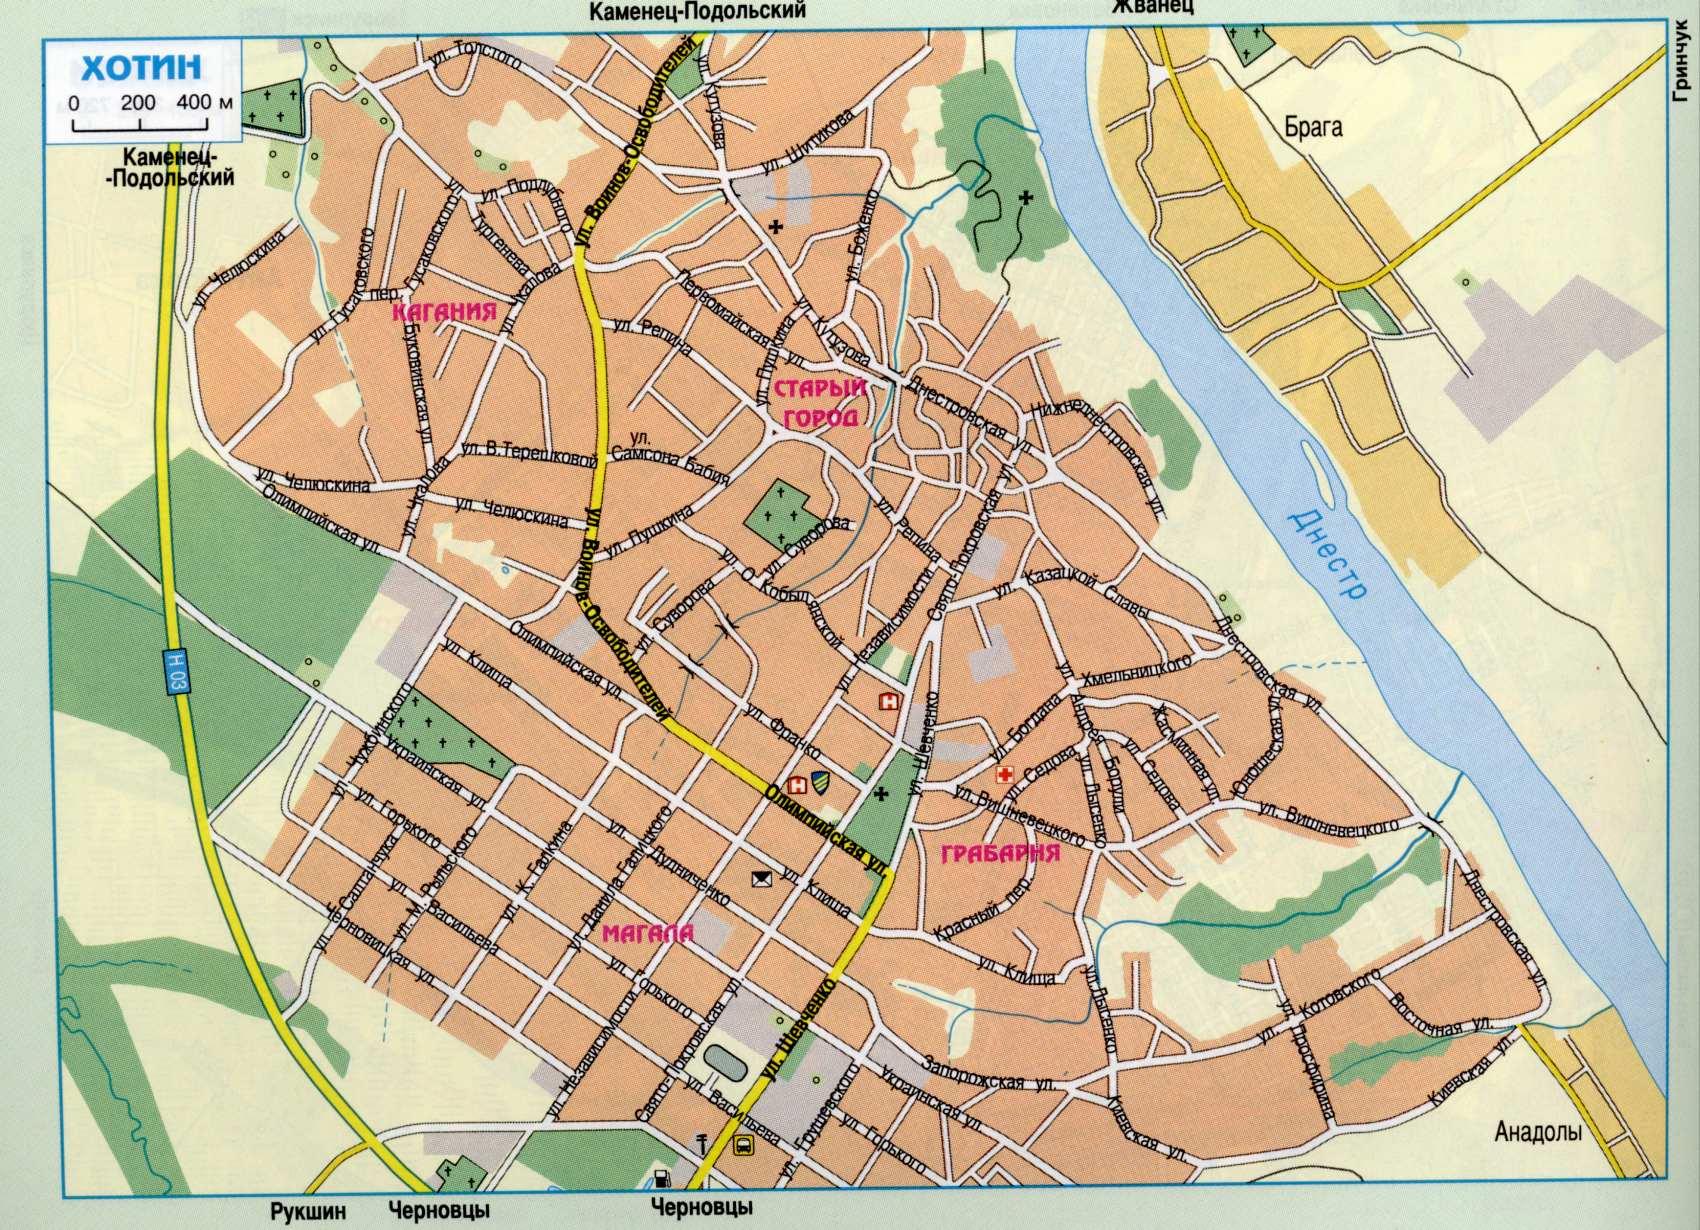 Карта города Хотин